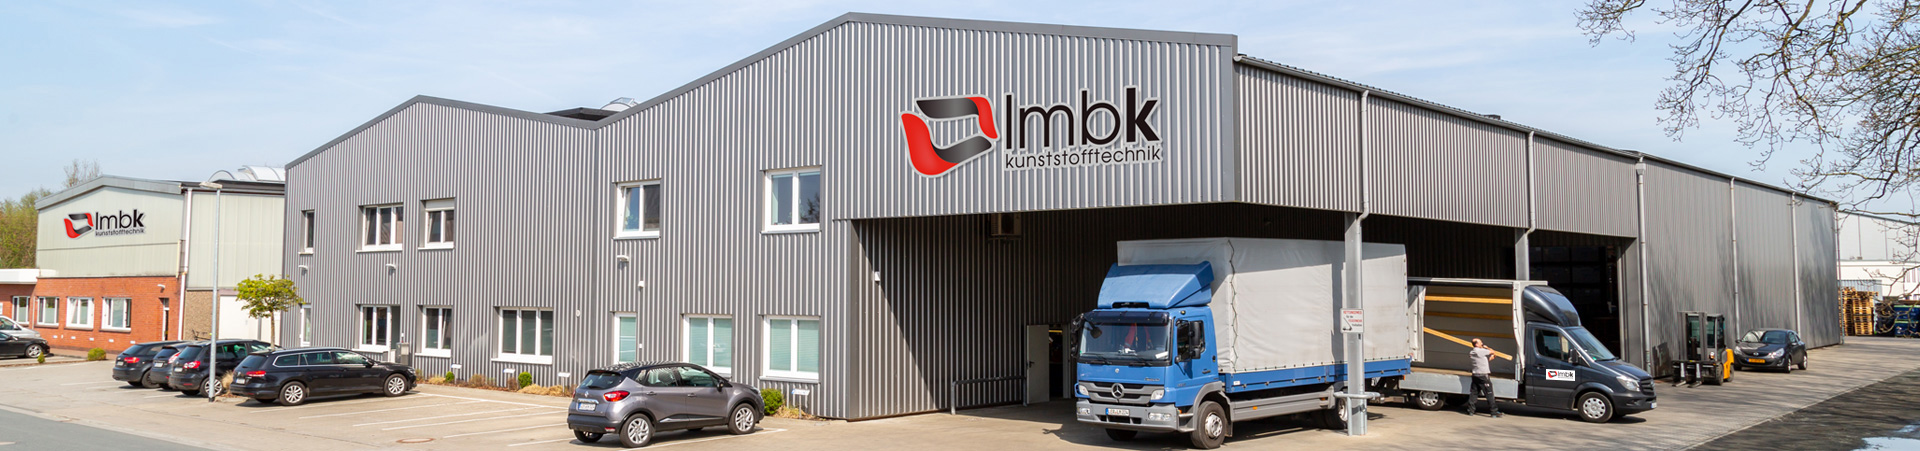 ueber_uns_lmb.jpg – LMB Kunstofftechnik GmbH